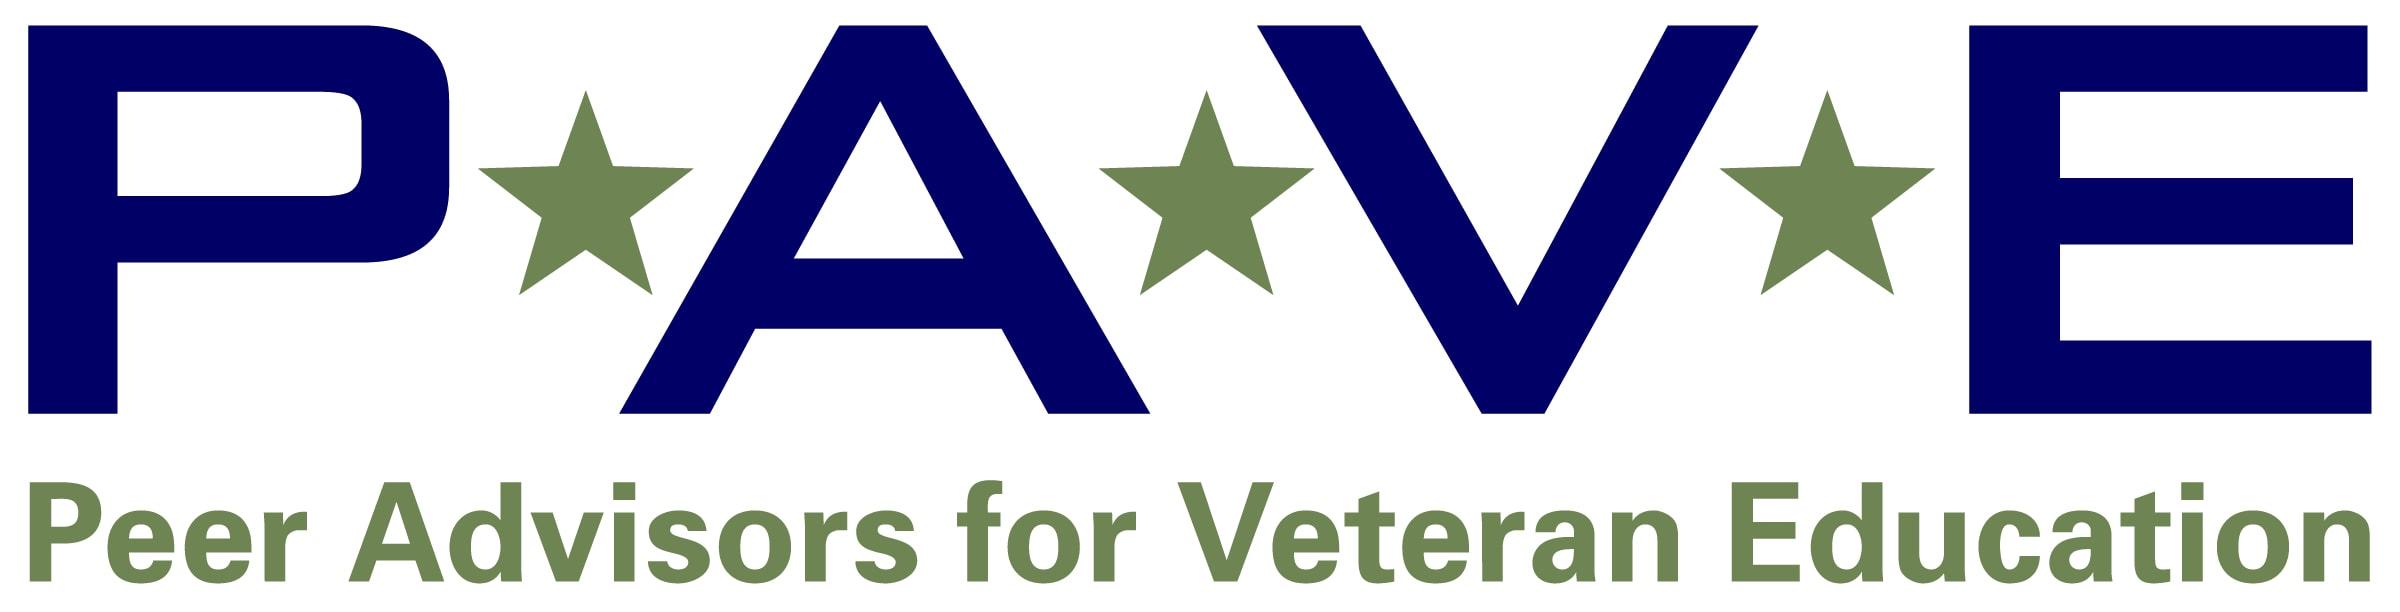 pave logo w. tagline